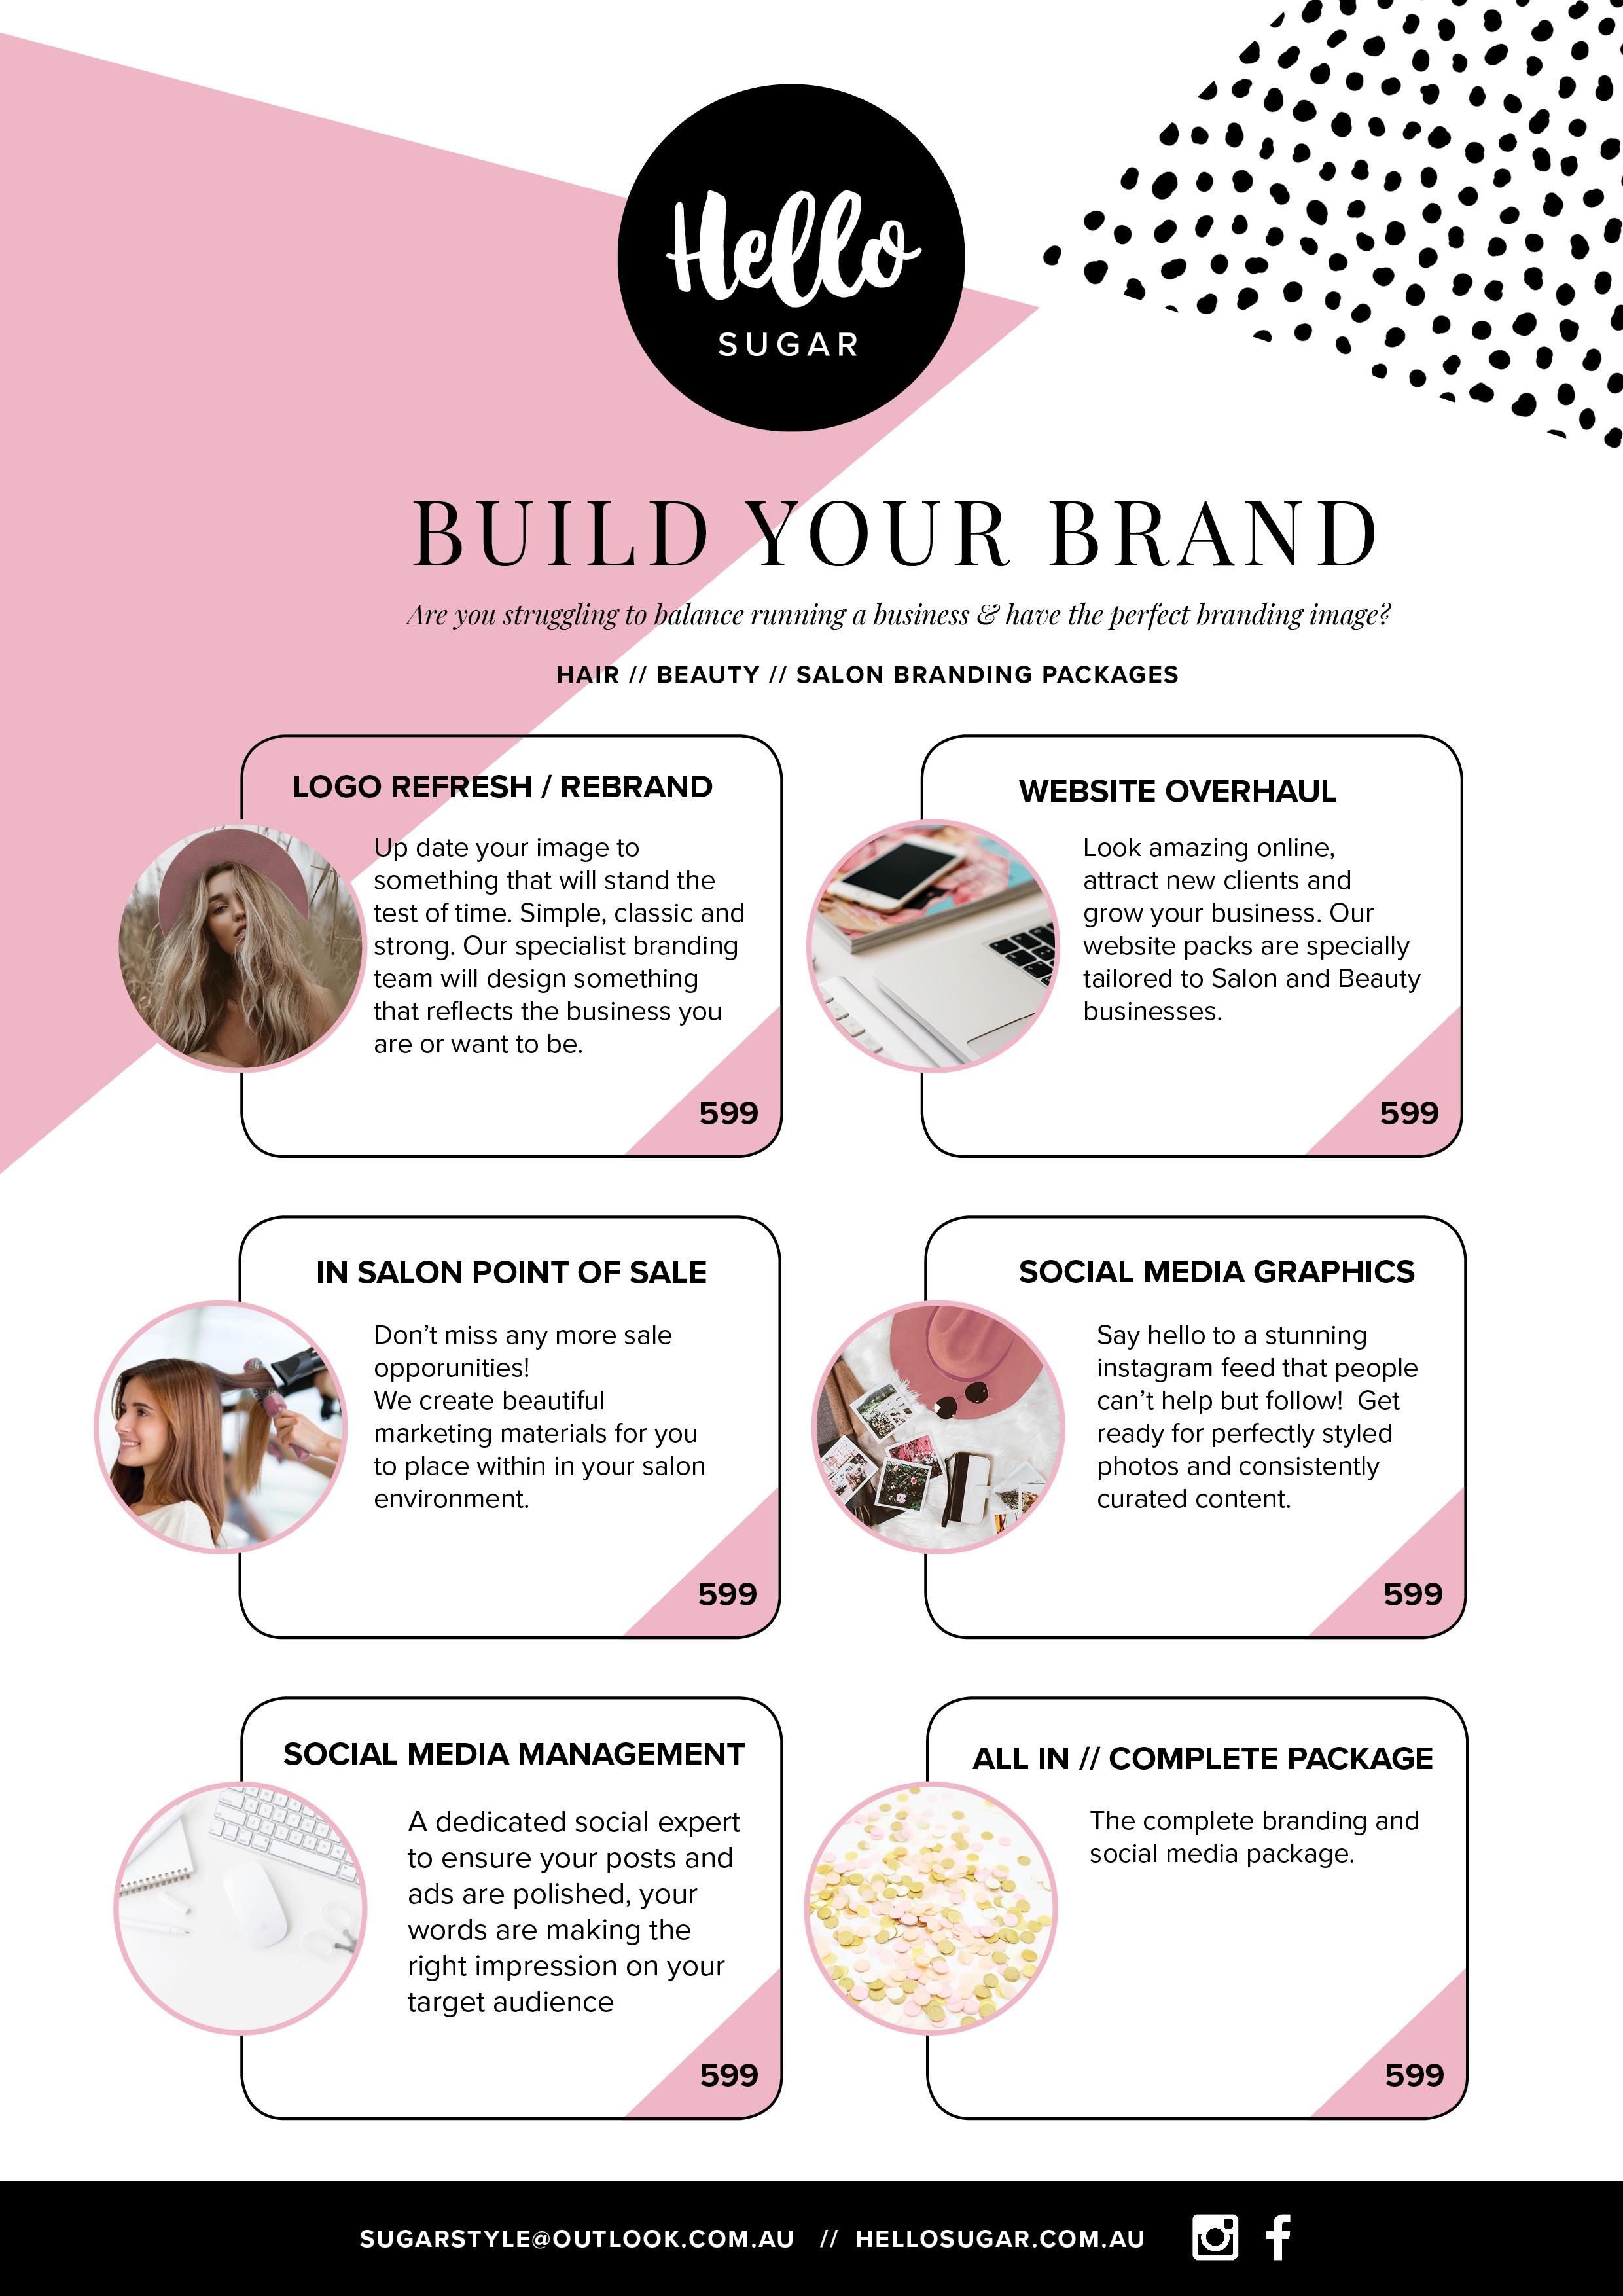 Build Your Brand_2.jpg